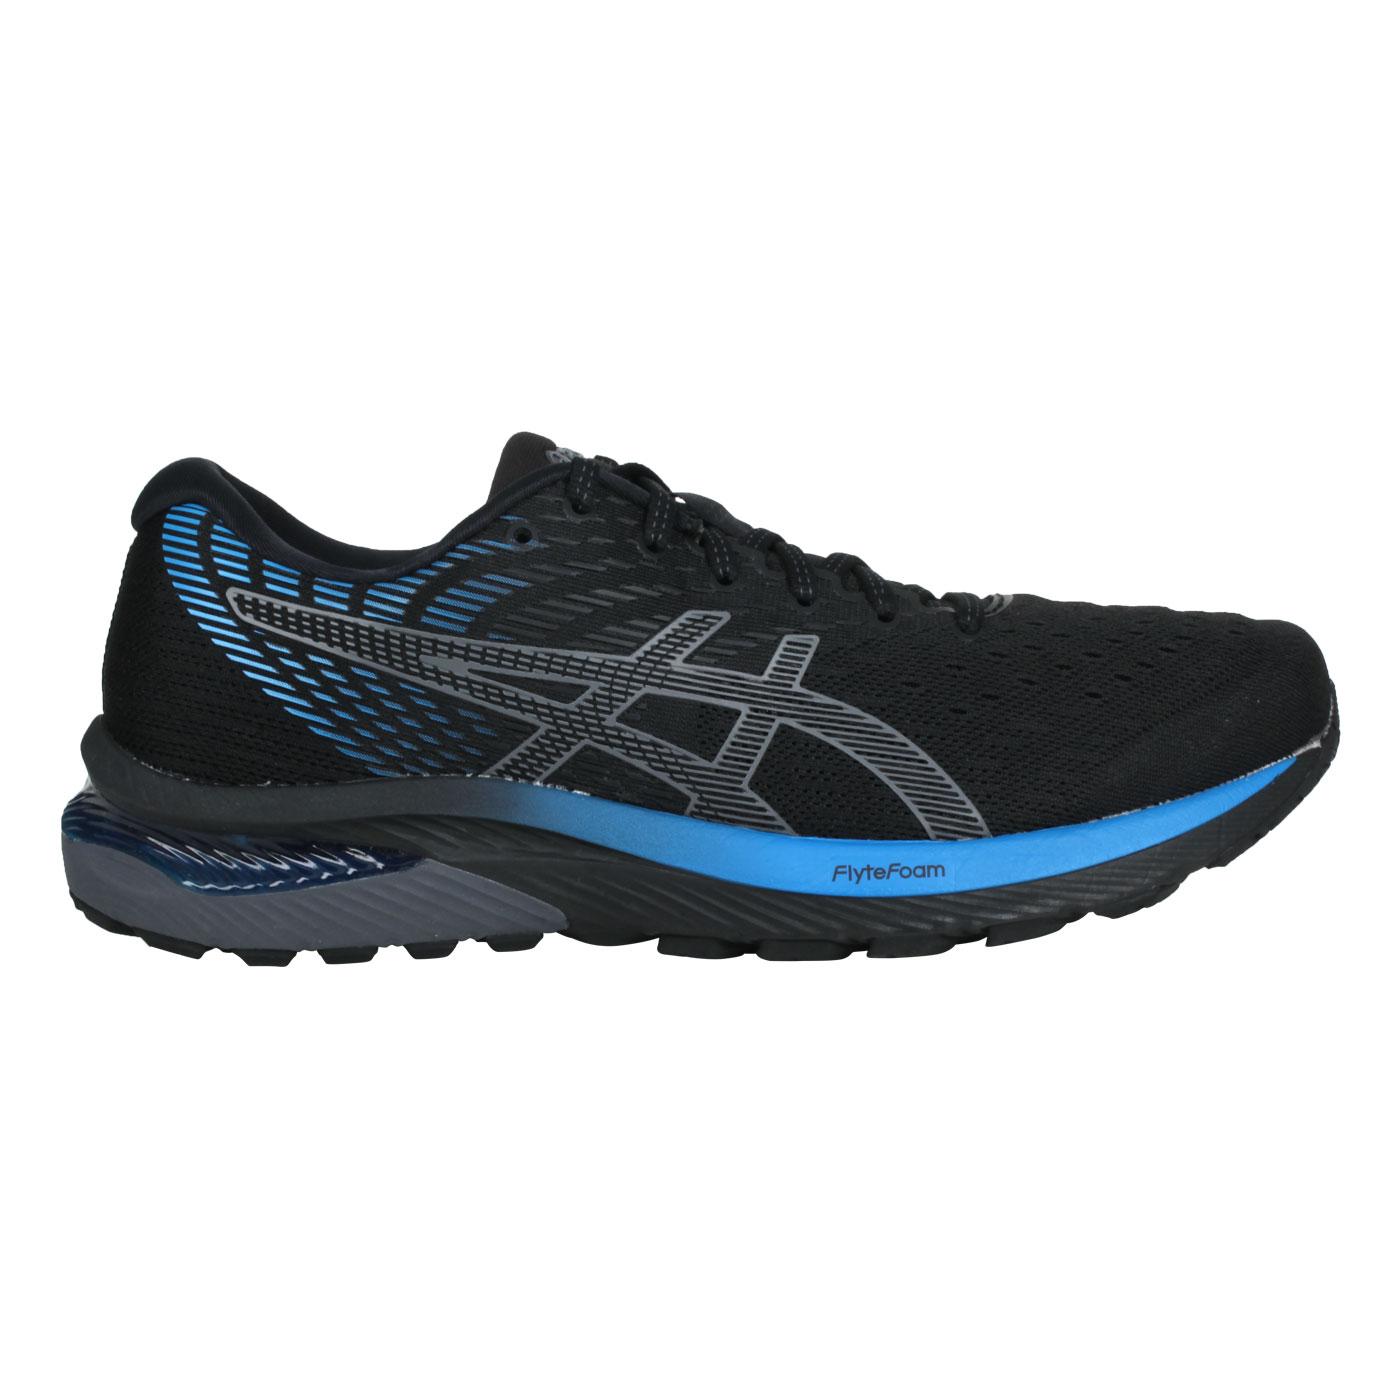 ASICS 男款慢跑鞋  @GEL-CUMULUS 22@1011A862-001